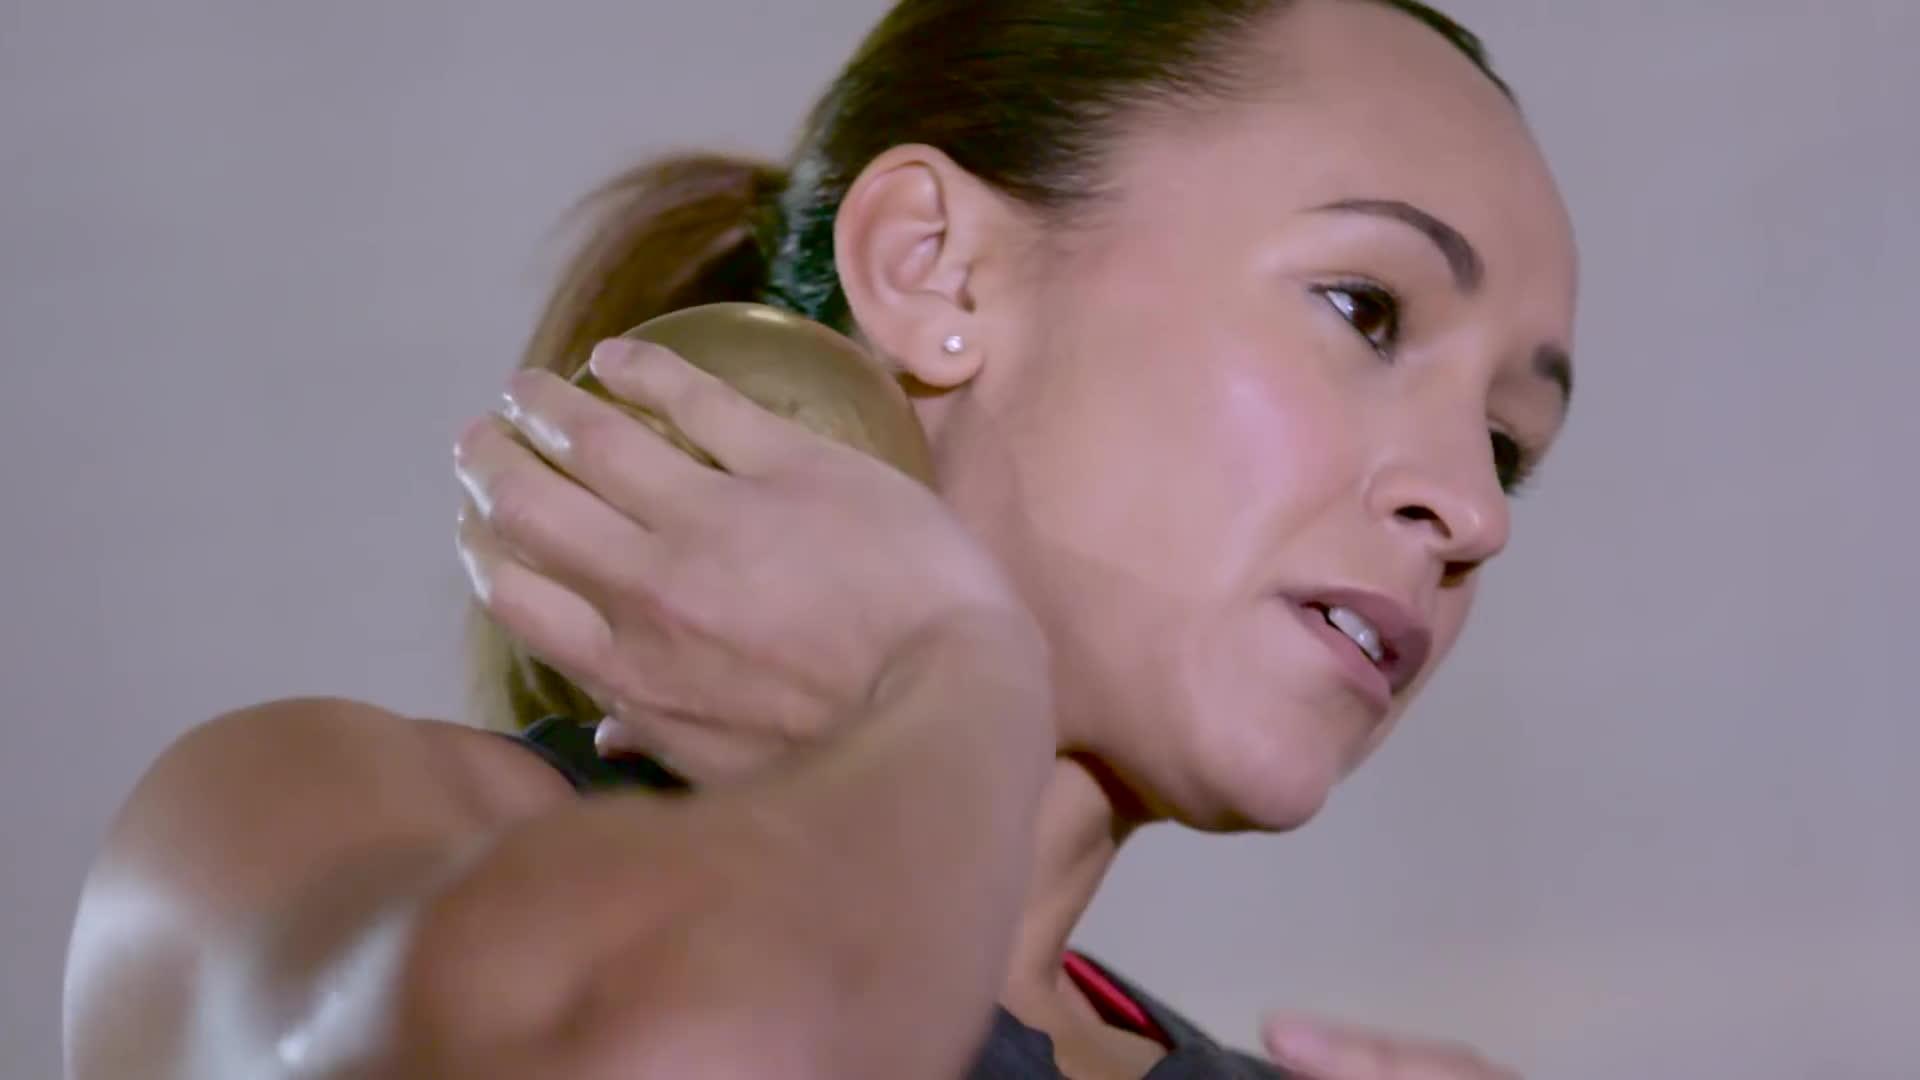 jessicaennishill, Jessica Ennis-Hill: Speed Takes Goals - adidas GIFs